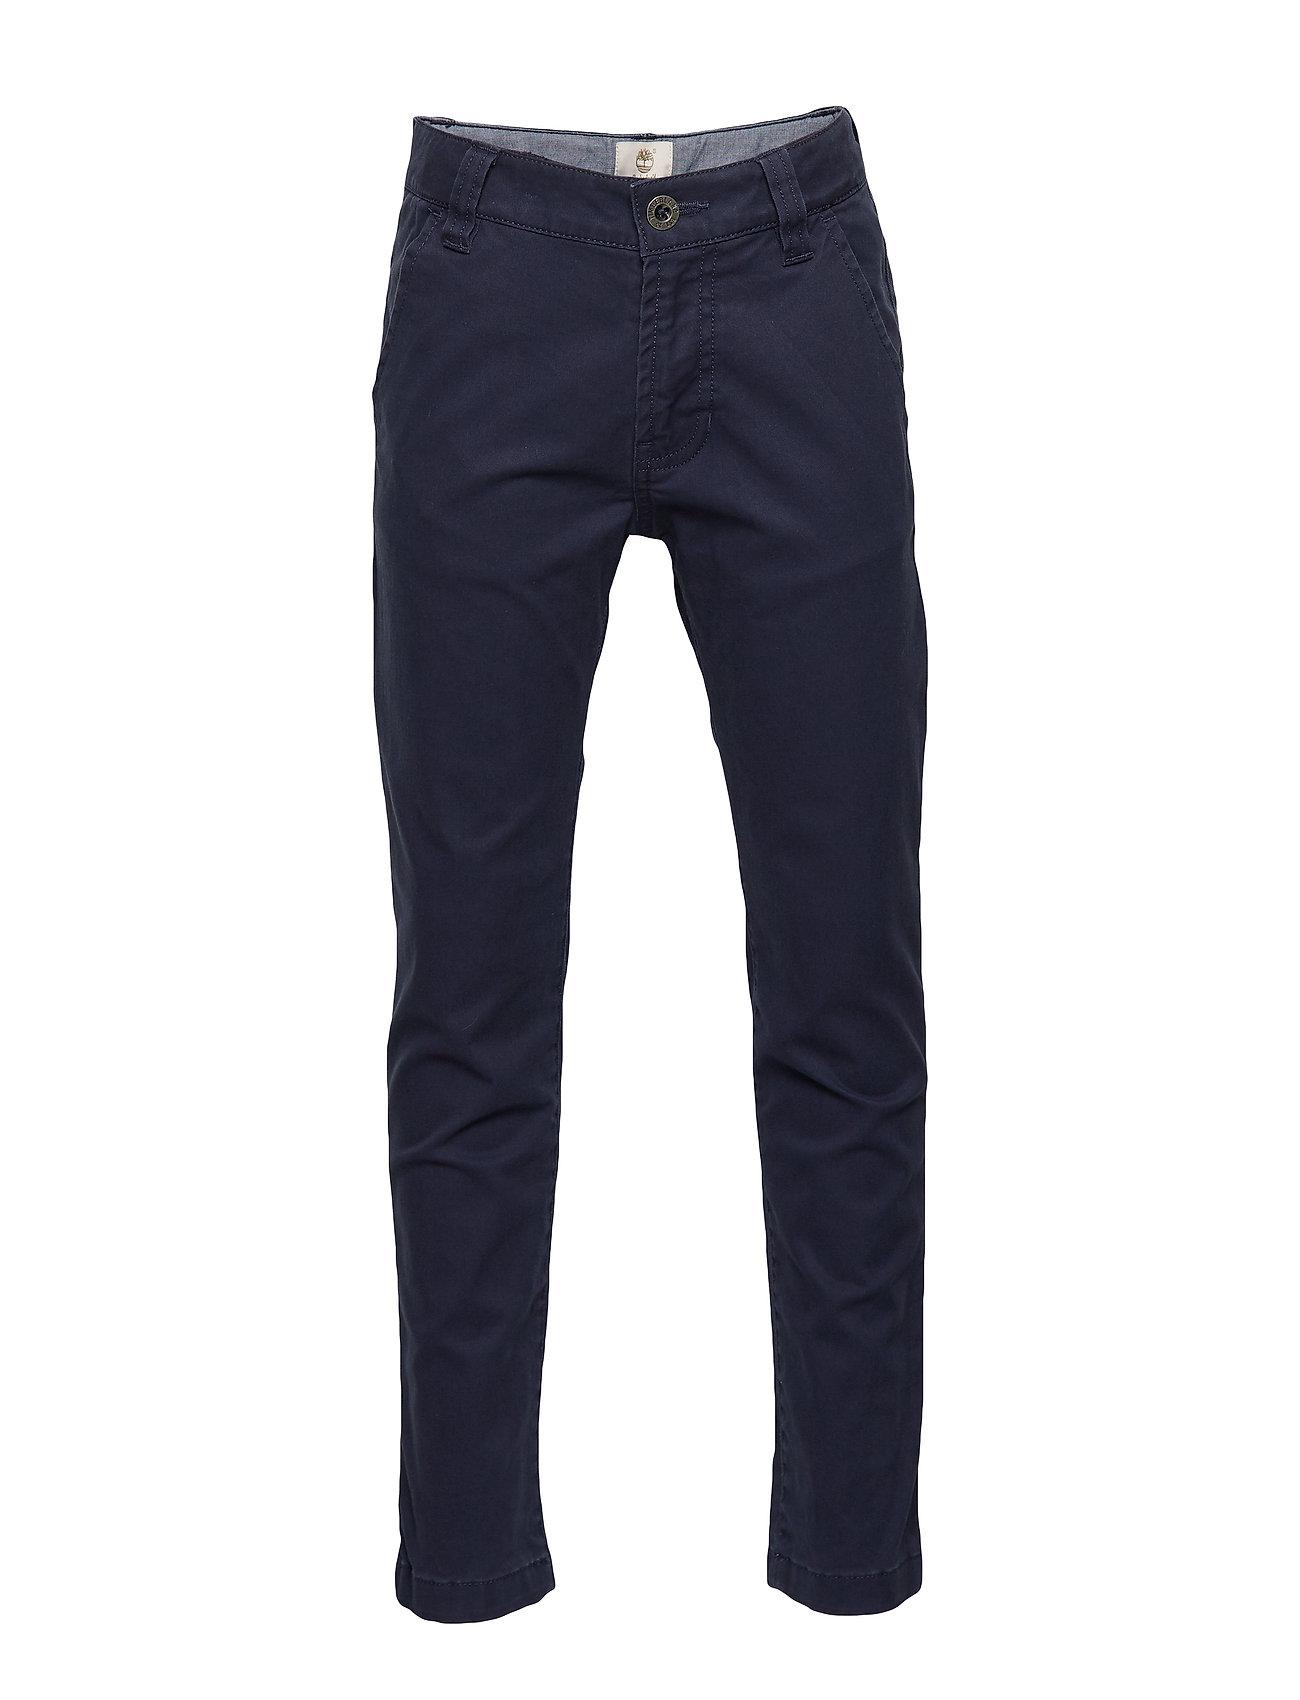 Image of Trousers Bukser Blå Timberland (3208536053)